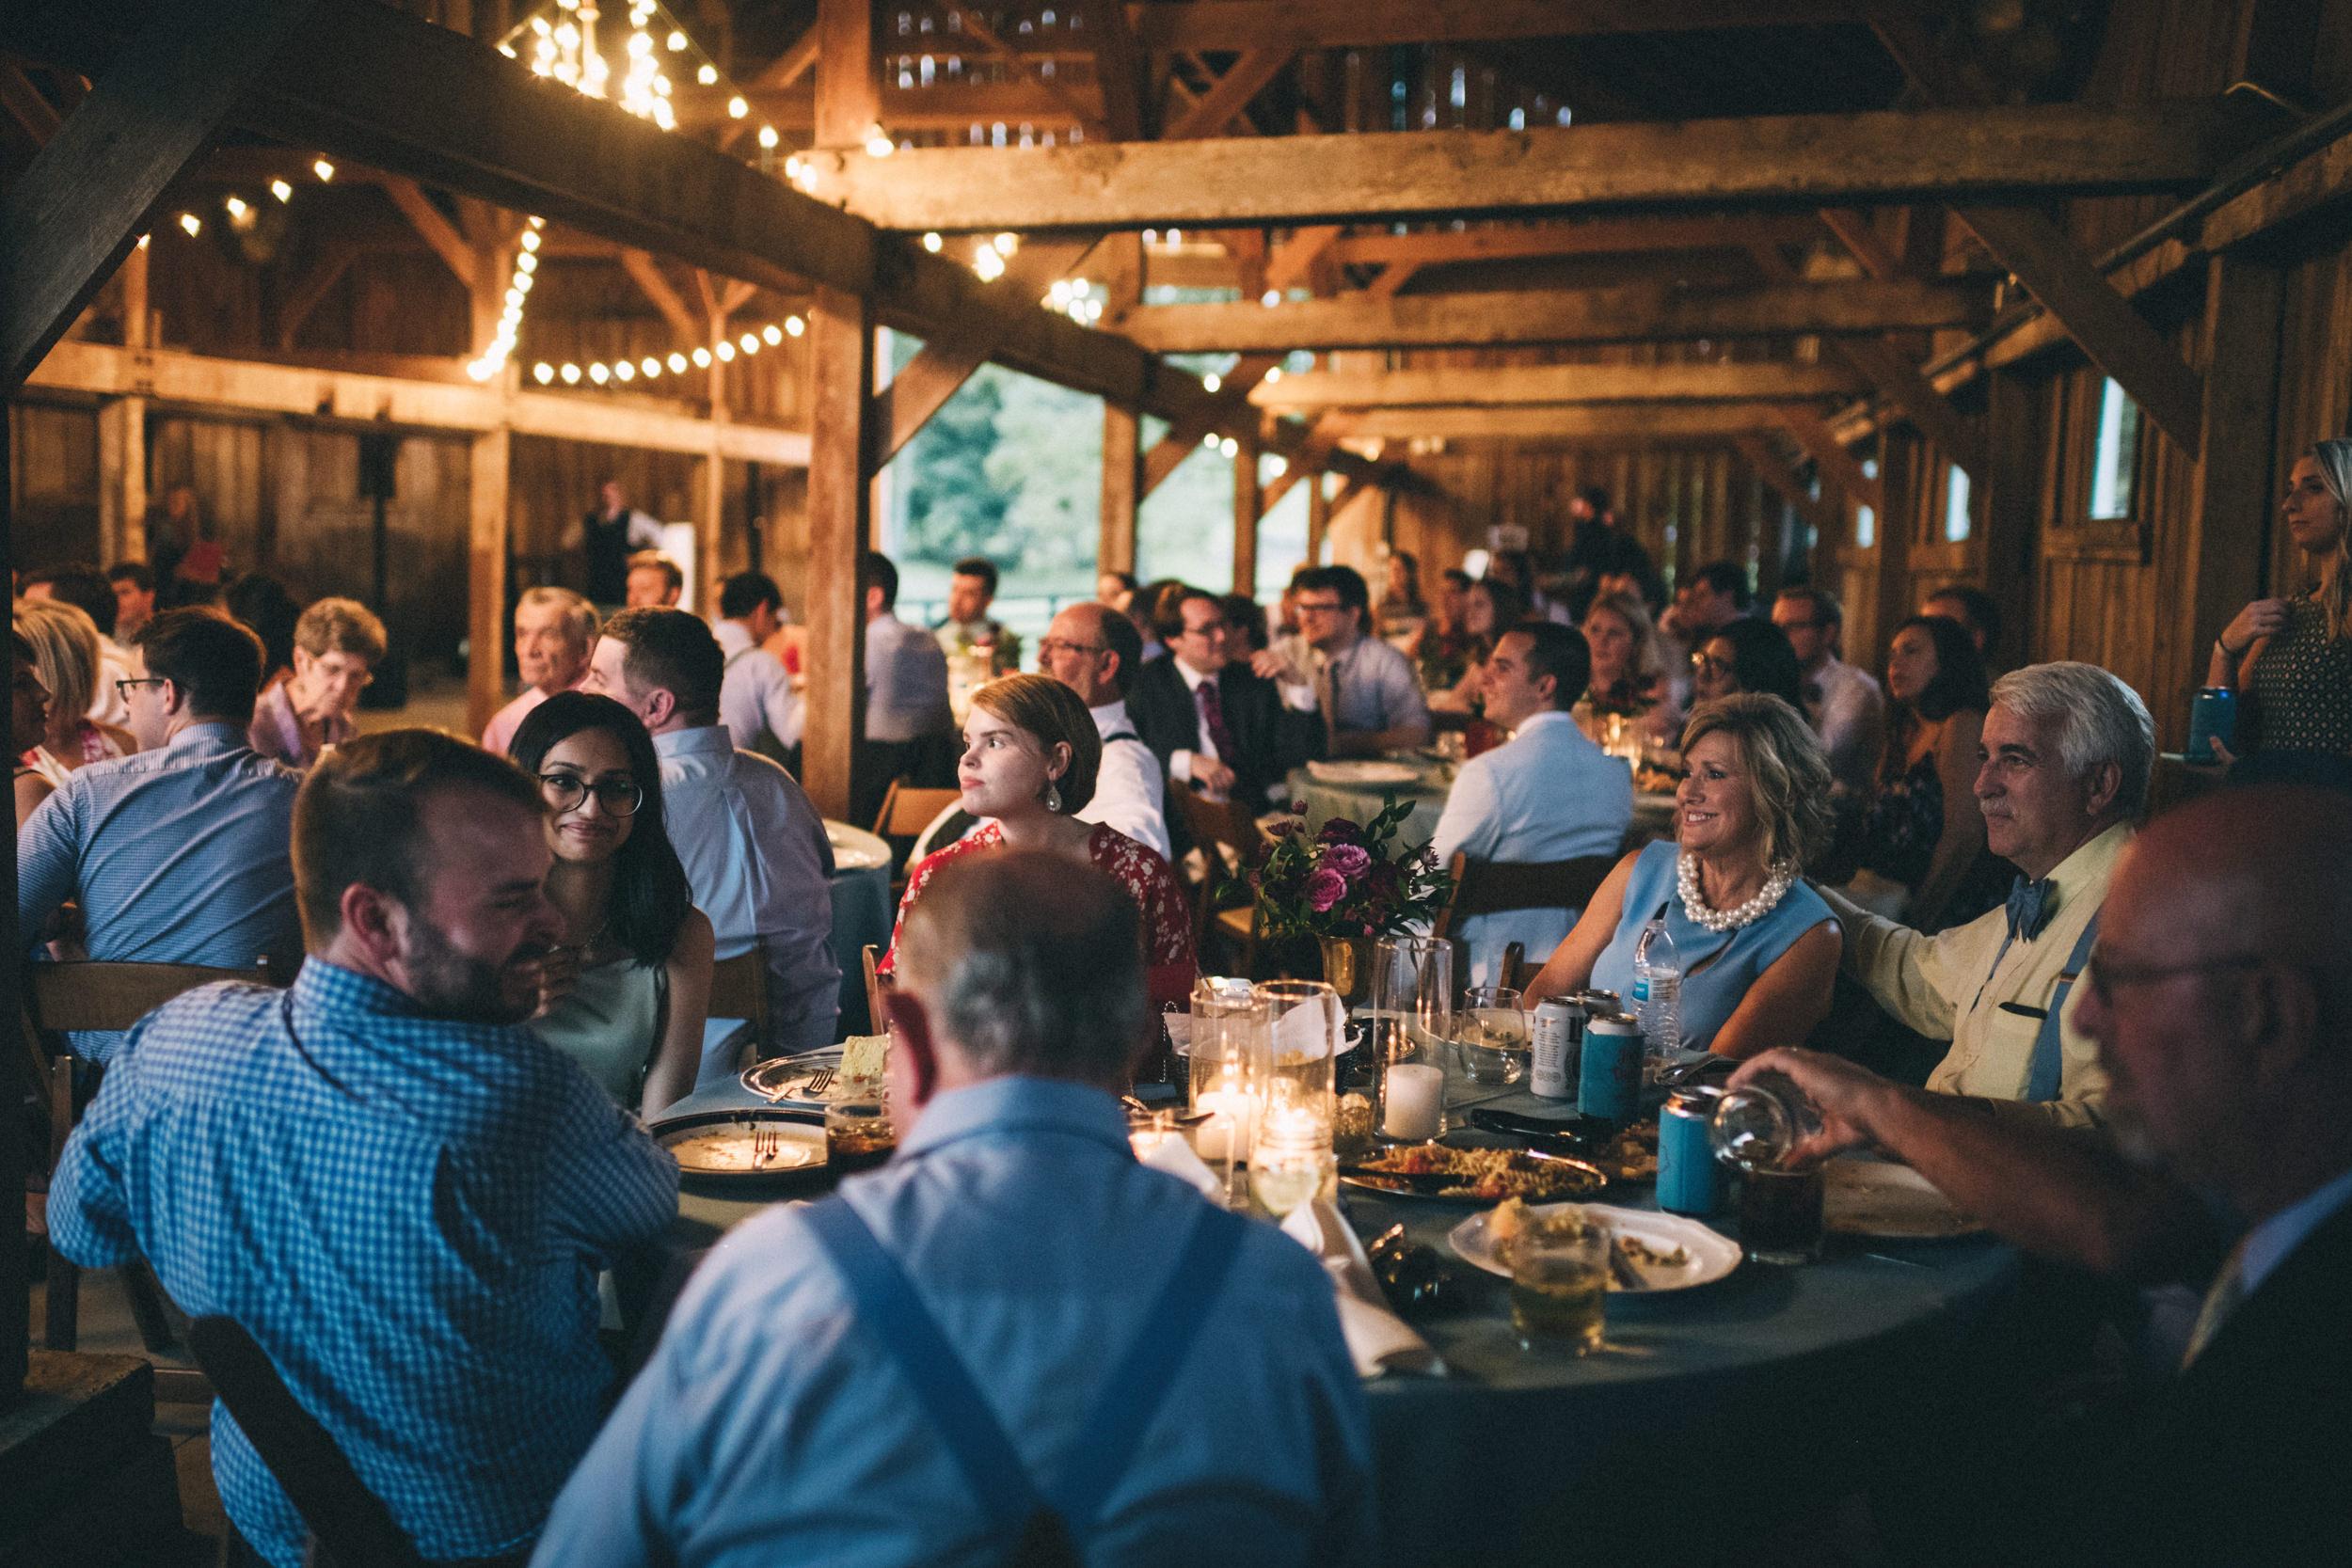 Louisville-Kentucky-Wedding-and-Elopement-Photographer-Sarah-Katherine-Davis-Photography-Summer-Jewel-Toned-Wedding-Chineese-Tea-Ceremony-Warrenwood-Manor-Danville-845.jpg